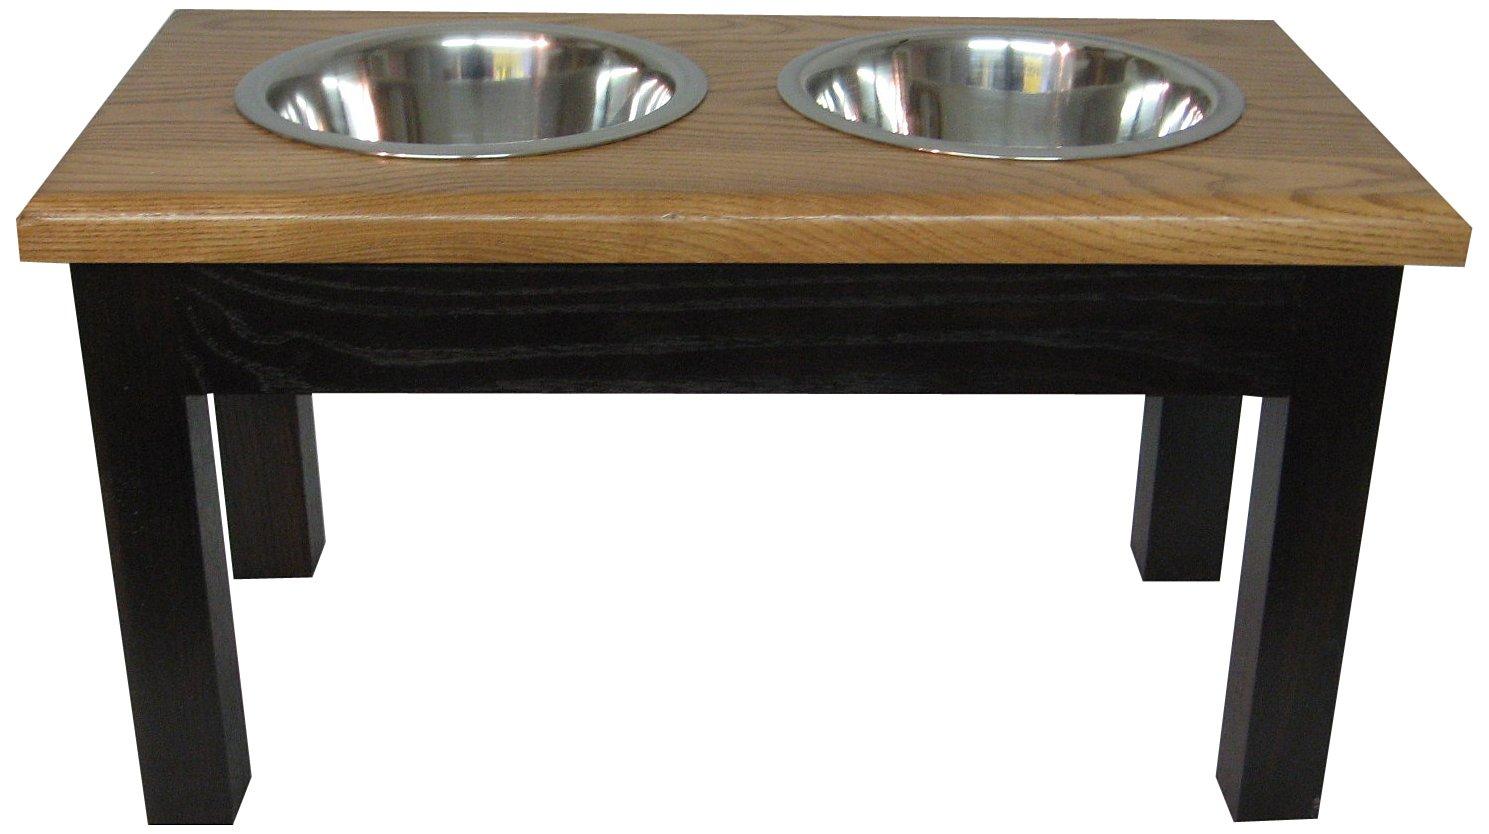 Classic Pet Beds 2-Bowl Traditional Style Ash Pet Diner, Small, Espresso/Medium Walnut